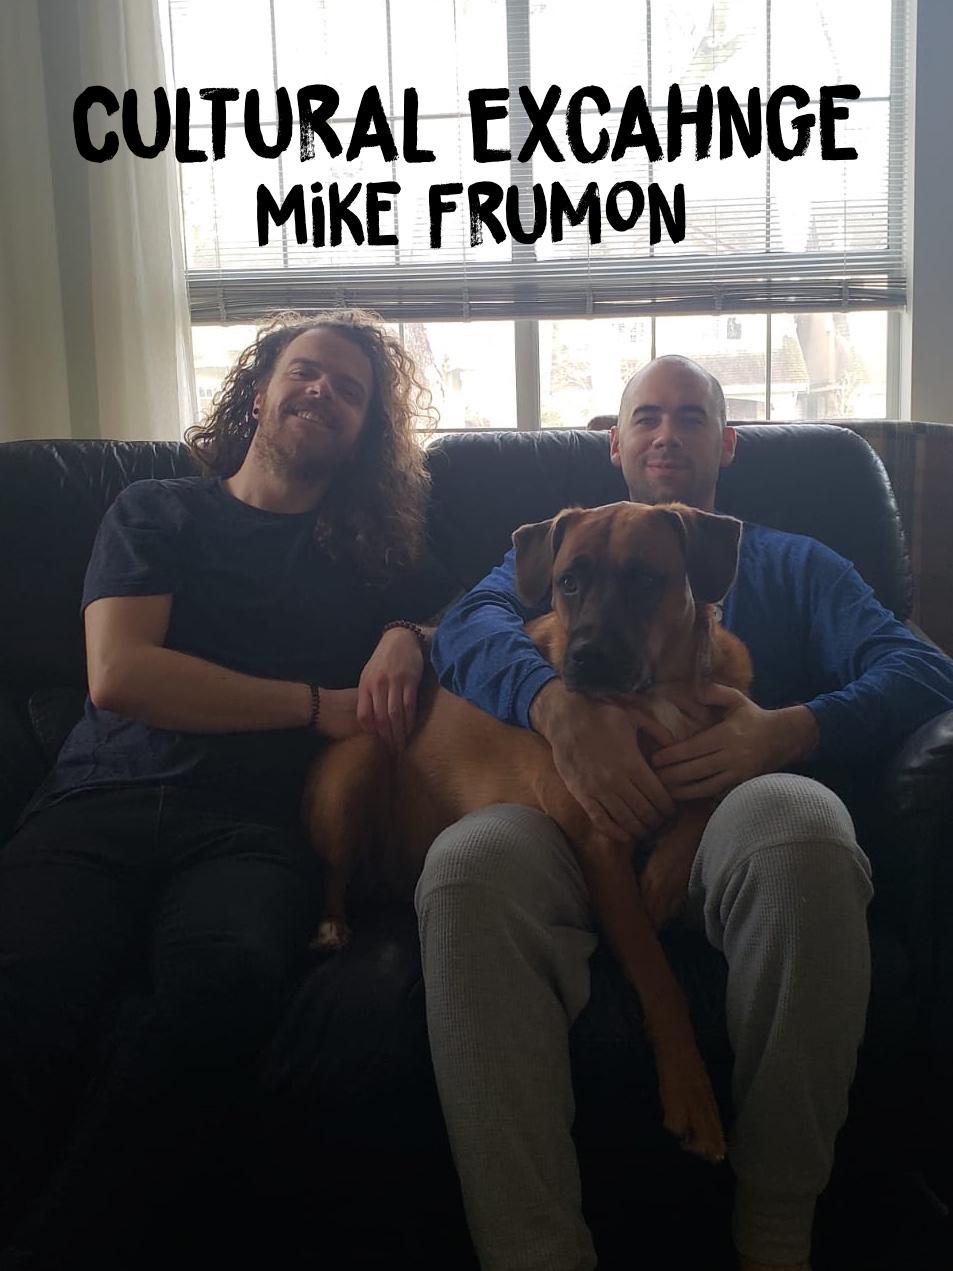 Mike Frumon